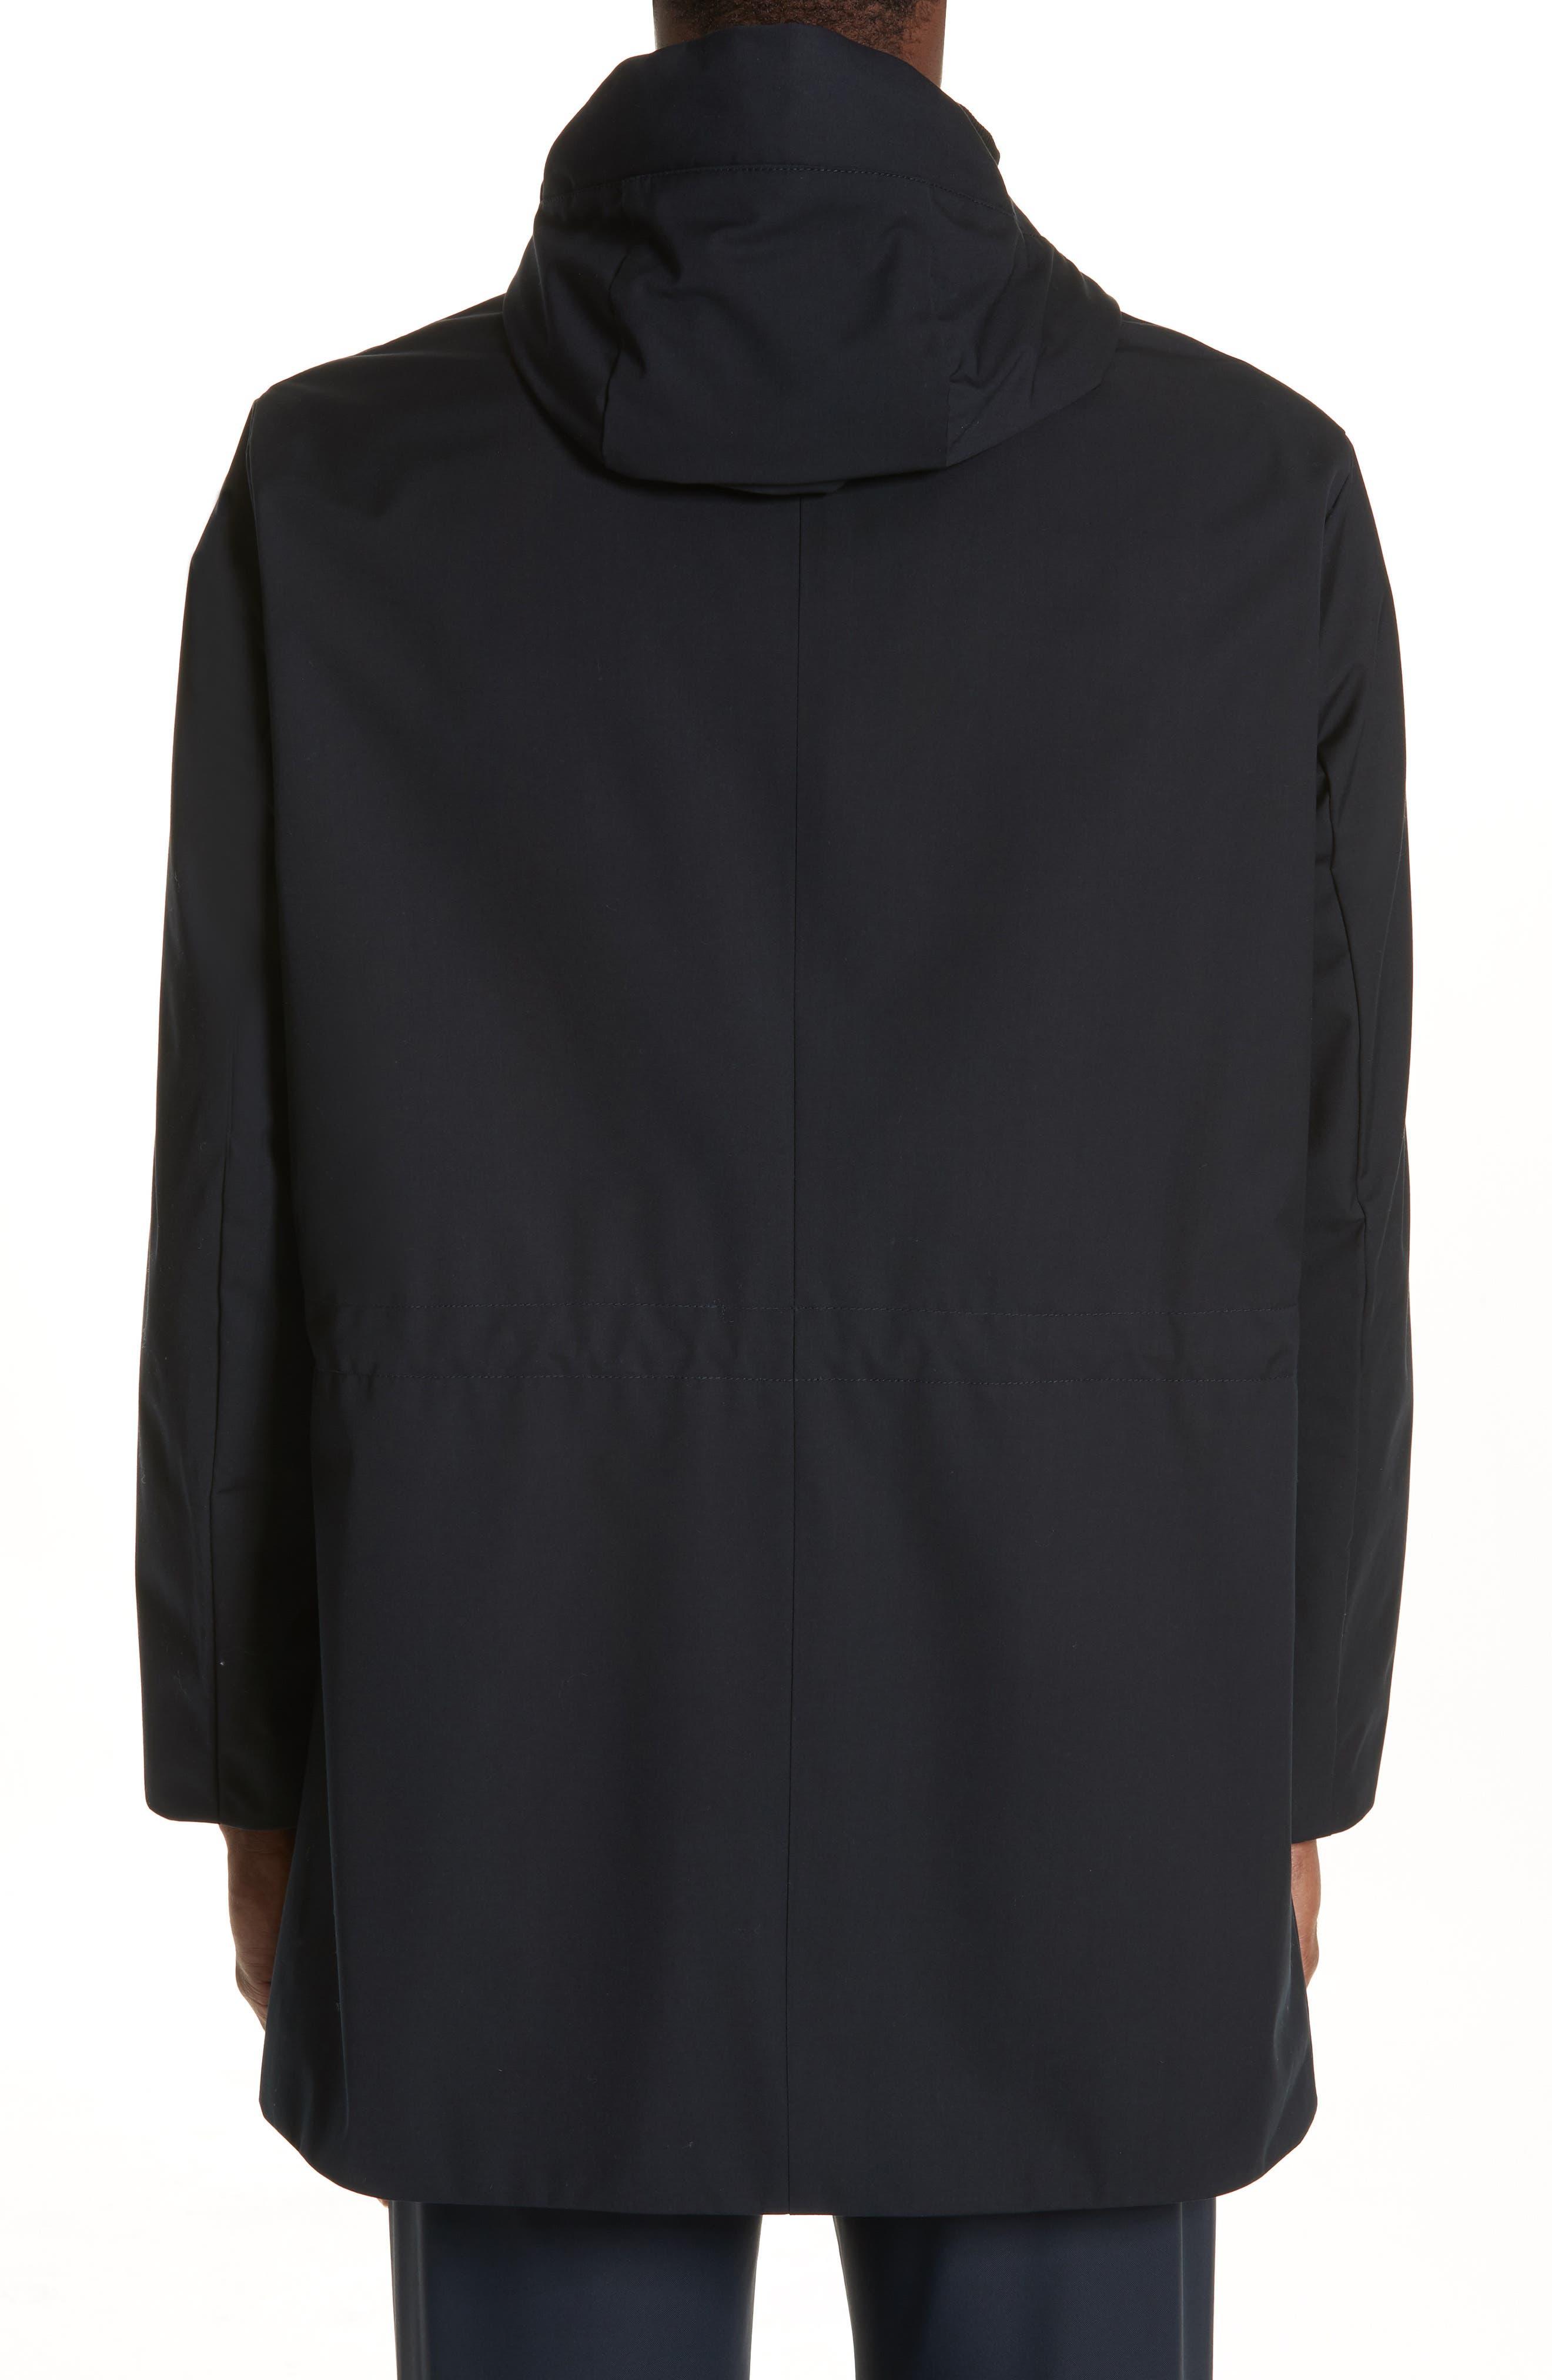 9ff24c86 Men's Emporio Armani Coats & Jackets | Nordstrom